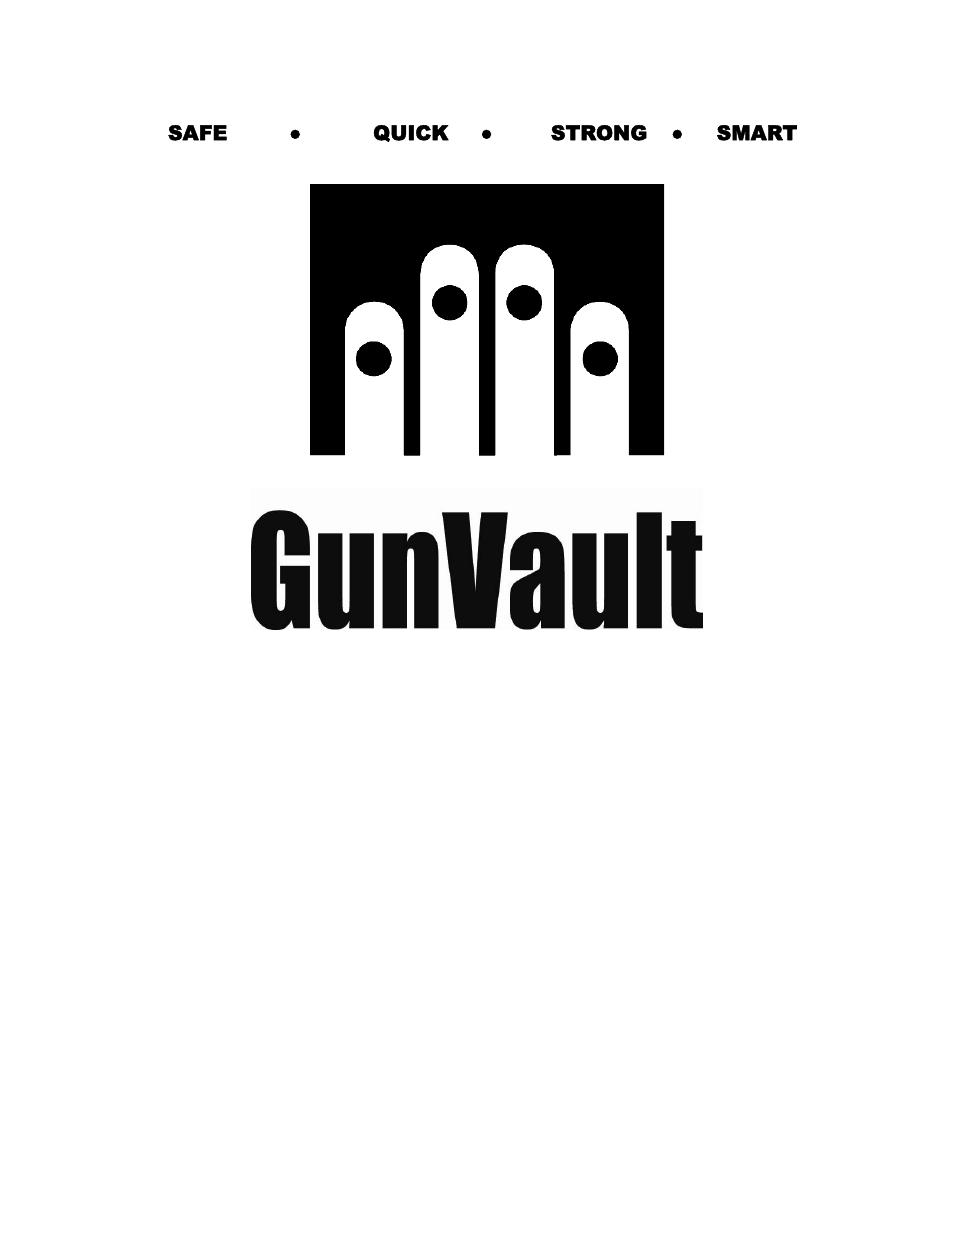 gunvault hv 5900 user manual 15 pages also for hv 5500 hv 3000 rh manualsdir com